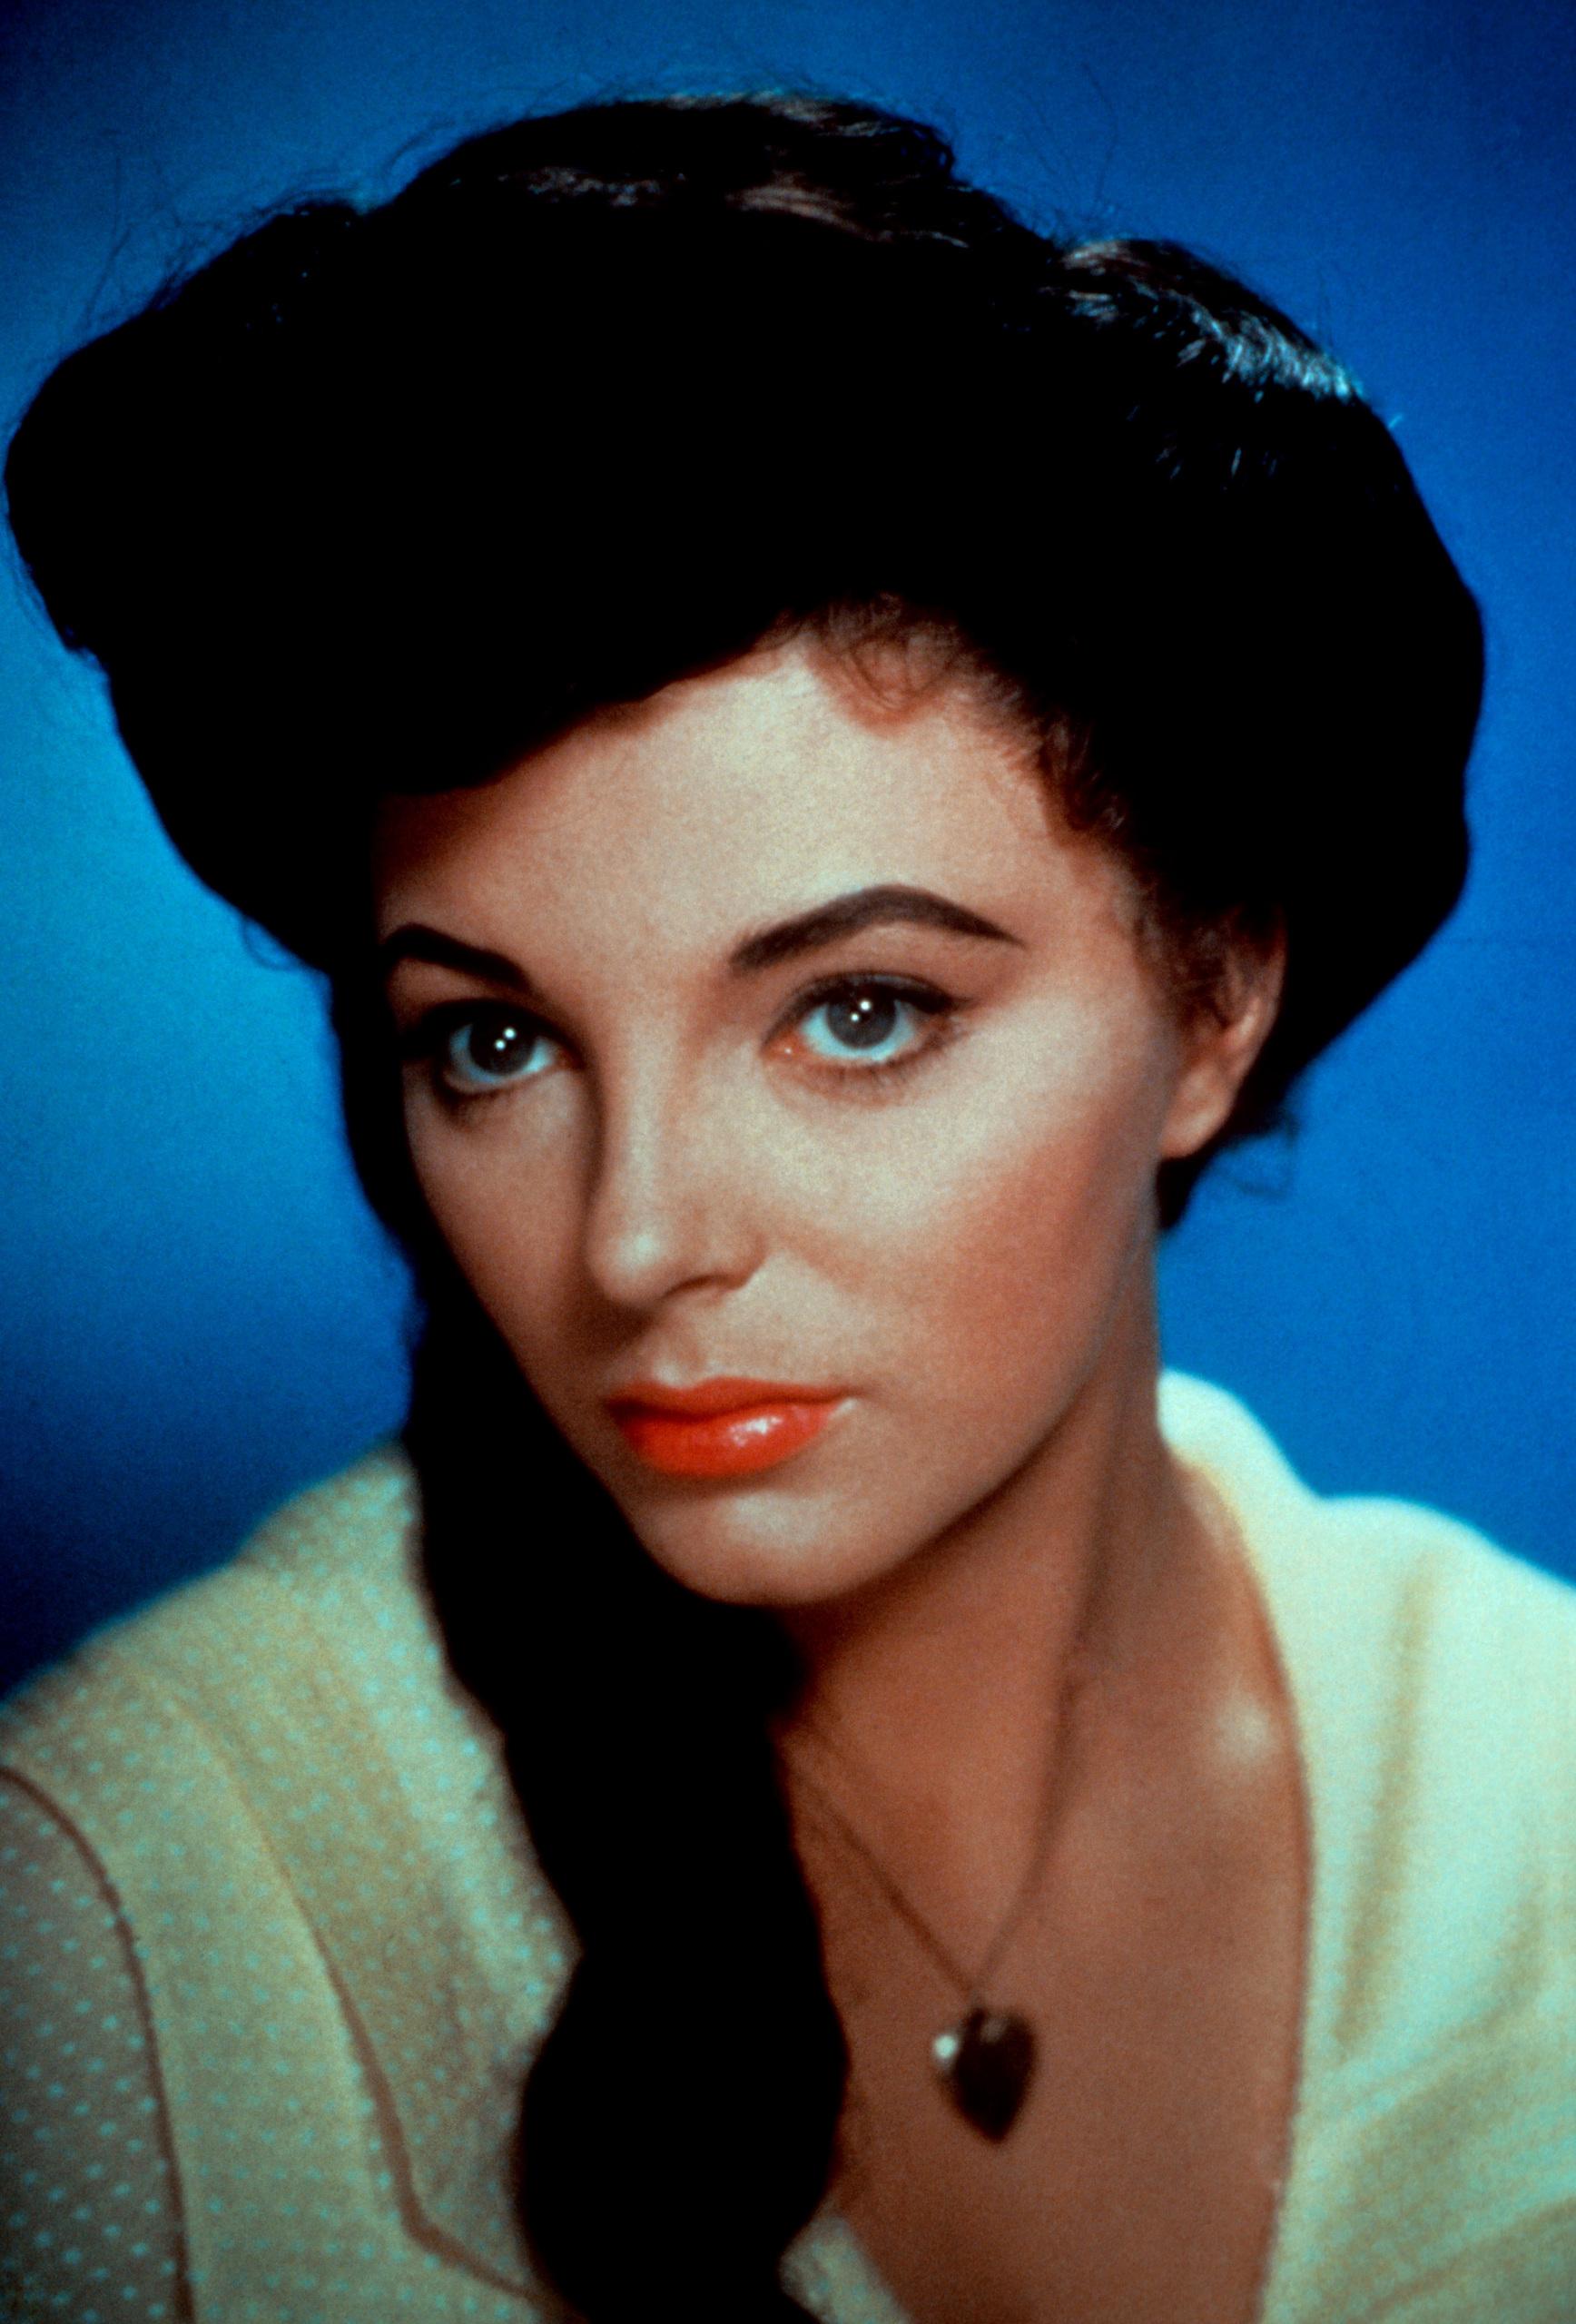 http://images4.fanpop.com/image/photos/21000000/Joan-Collins-joan-collins-21098226-1736-2560.jpg